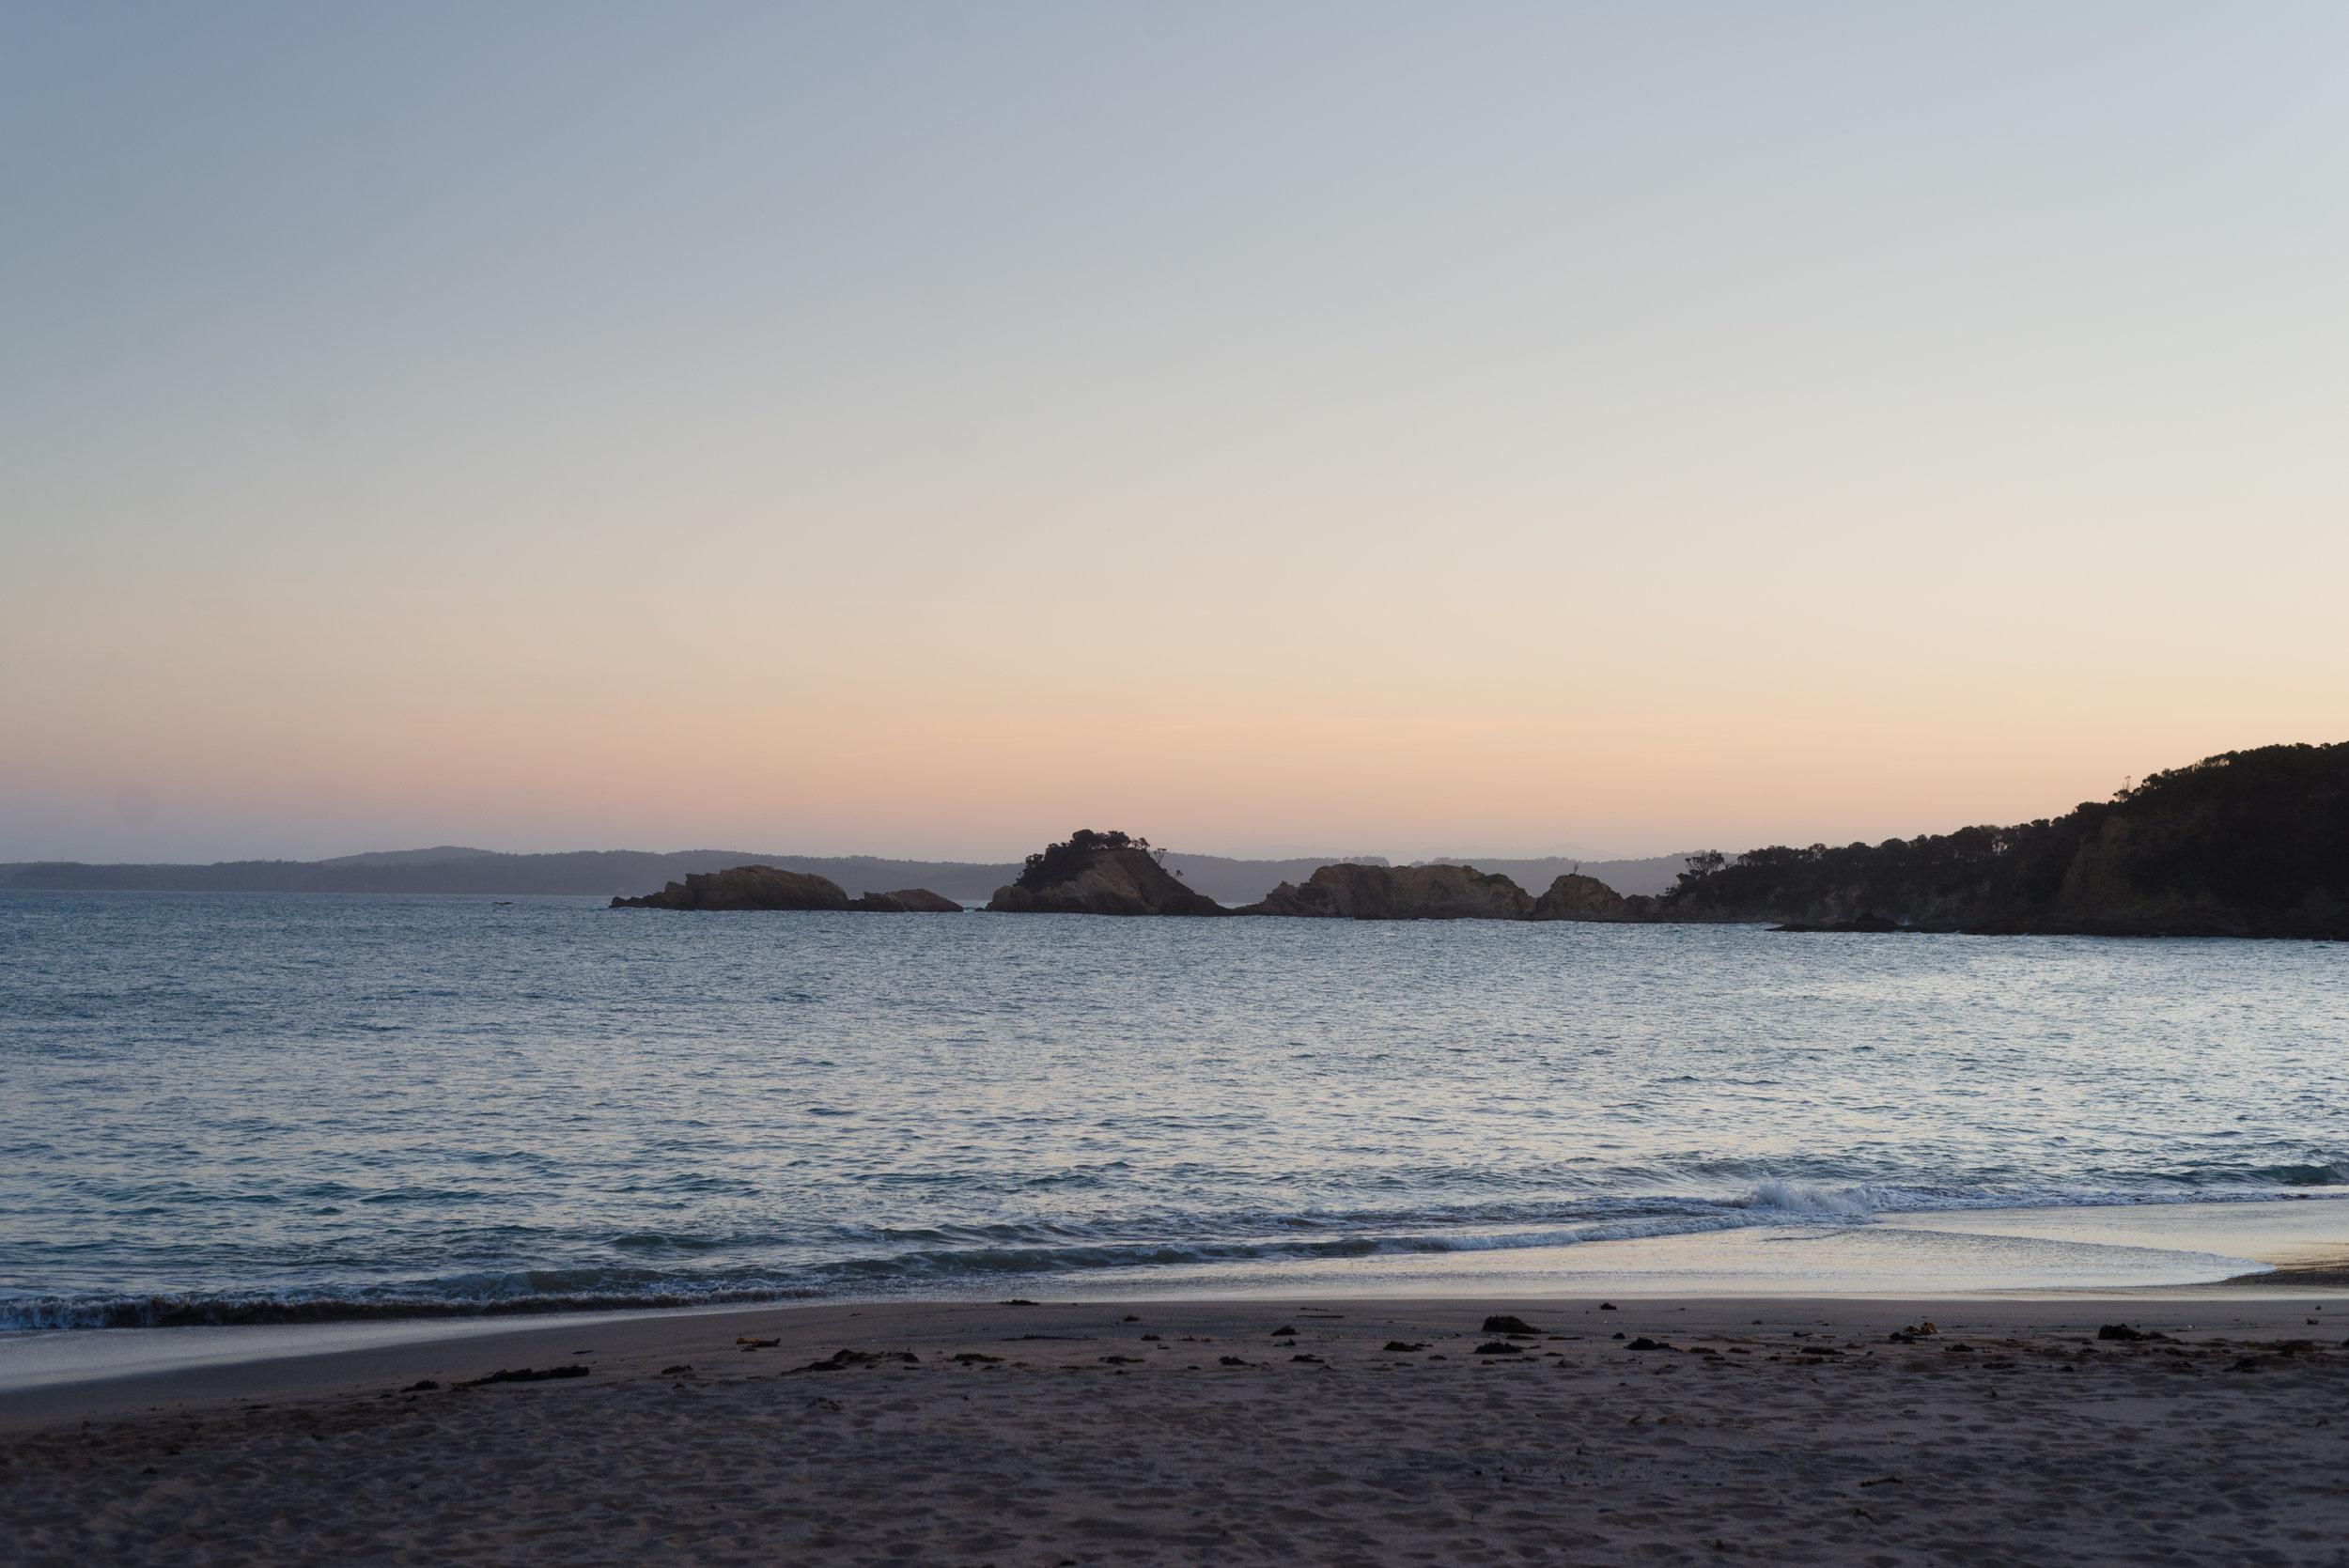 sunset at north head beach nsw